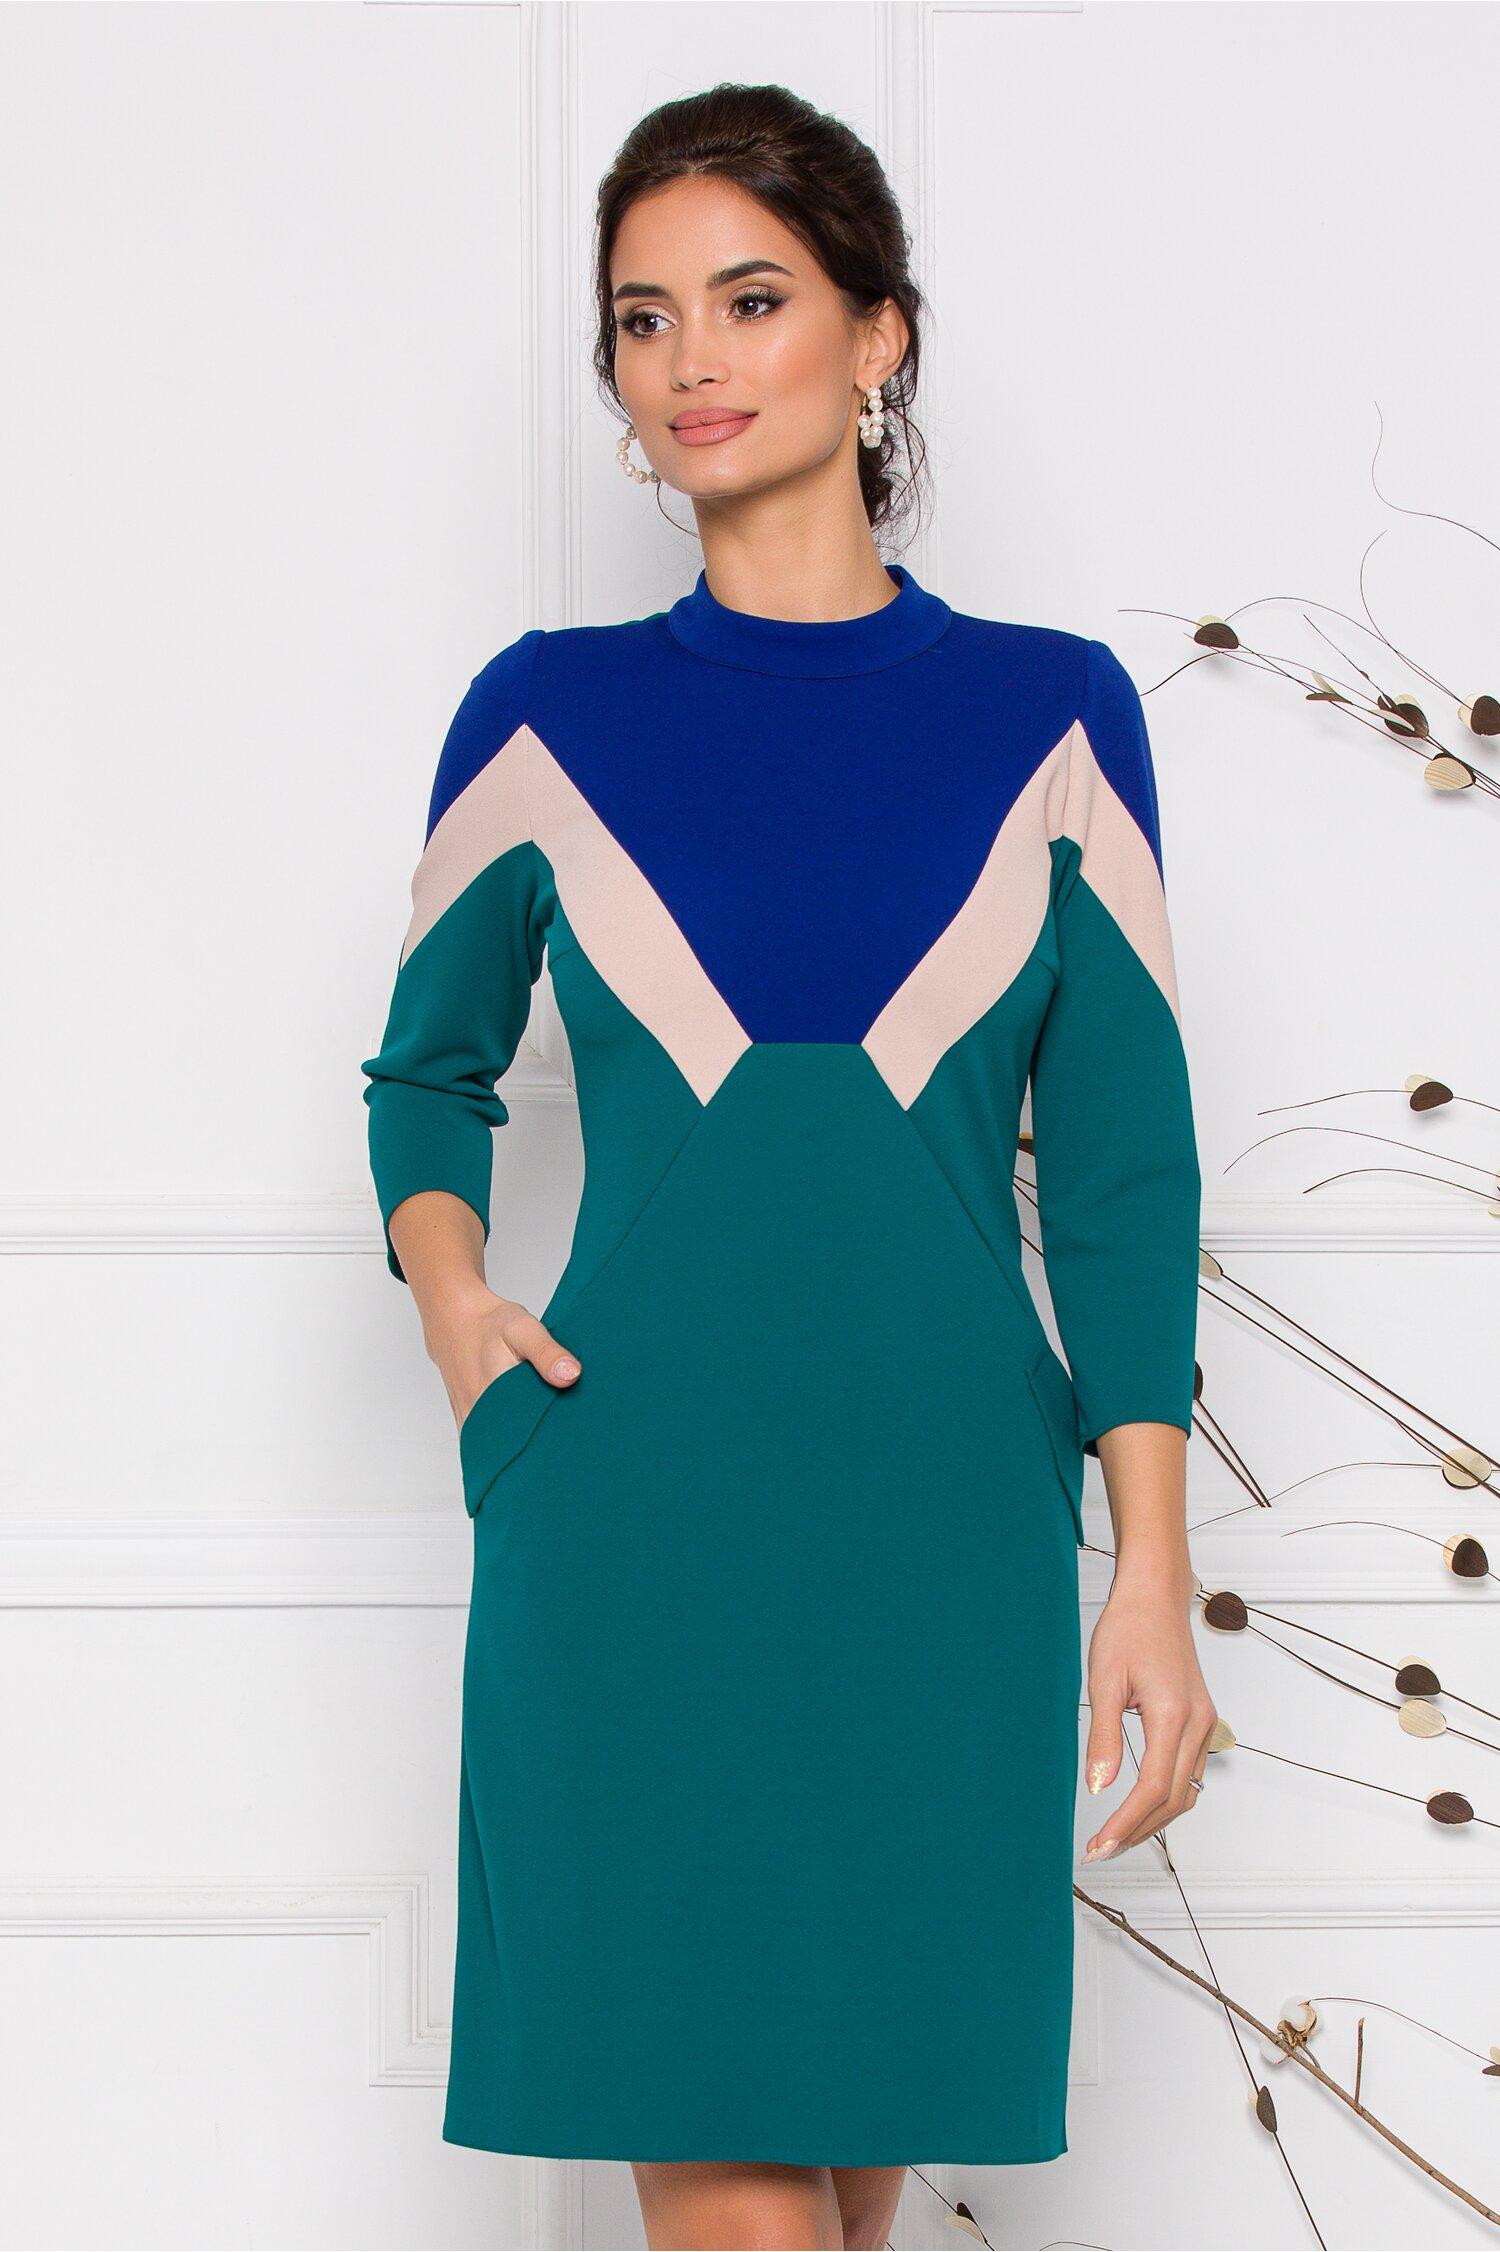 Rochie Moze verde cu insertii de albastru si bej imagine